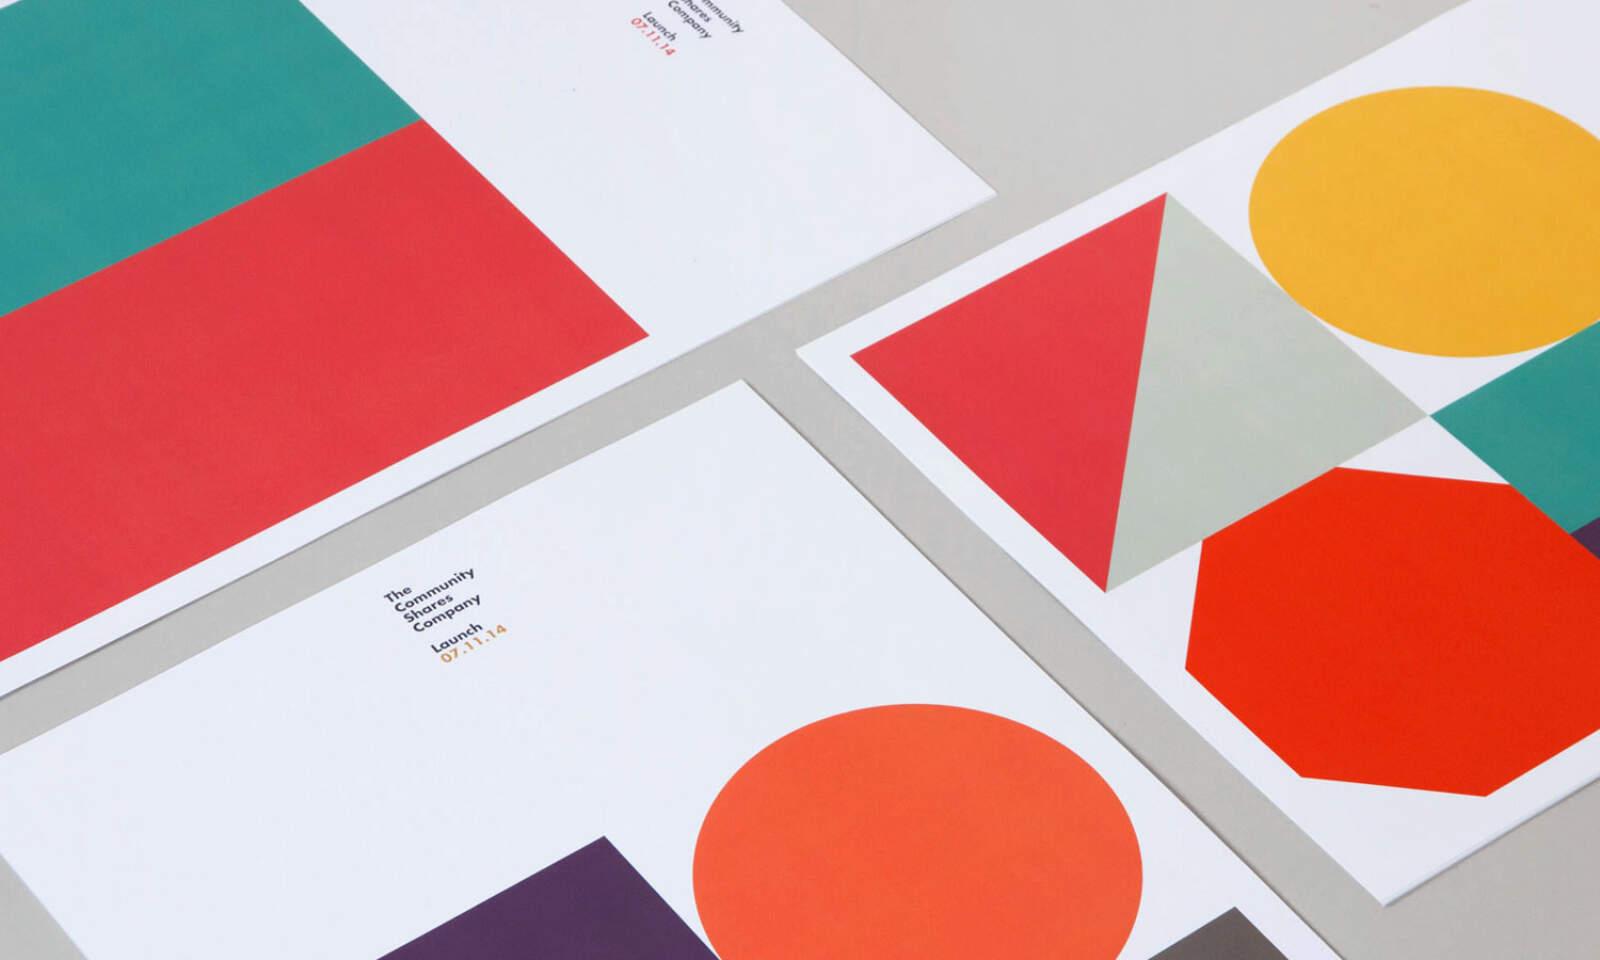 Community Shares geometric branding system, used across printed stationery.